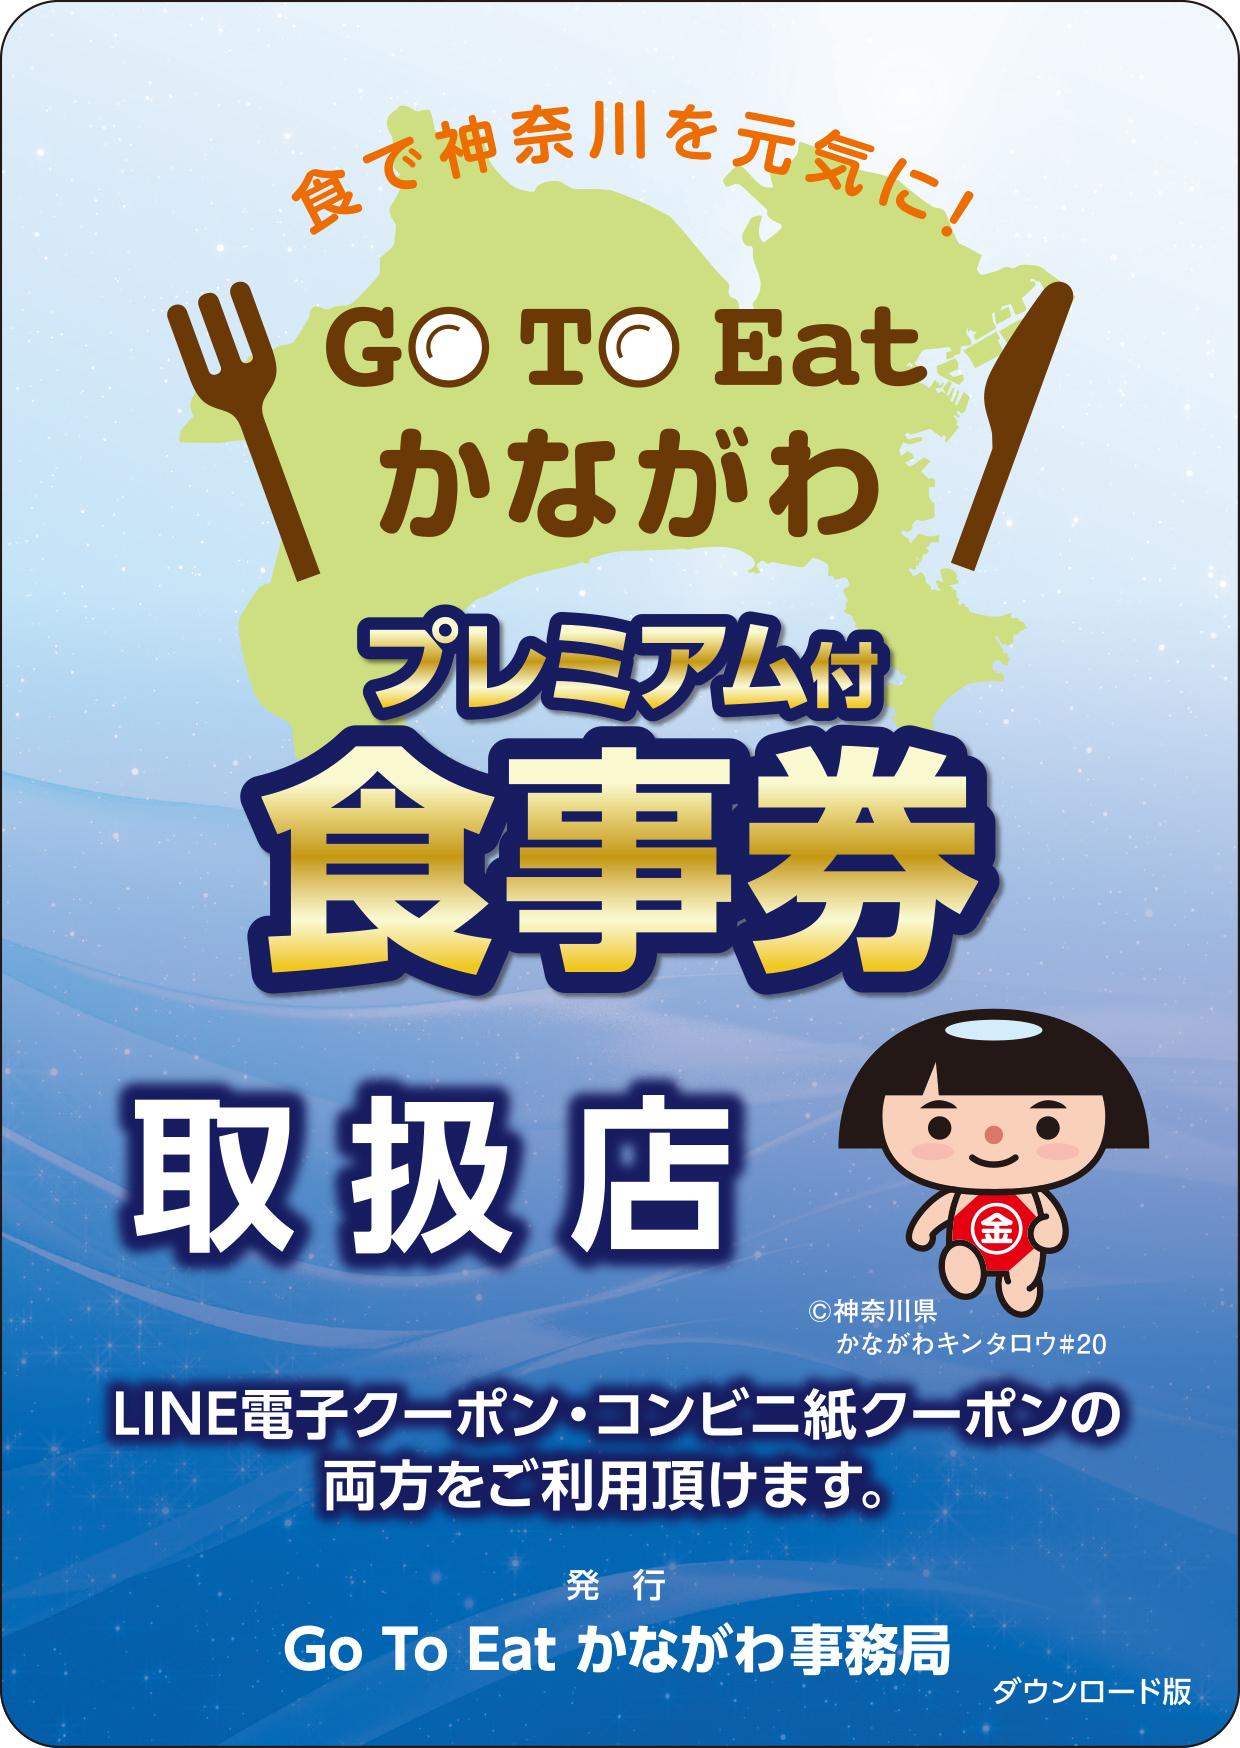 GoToEat加盟店の[円居 -MADOy- 川崎]